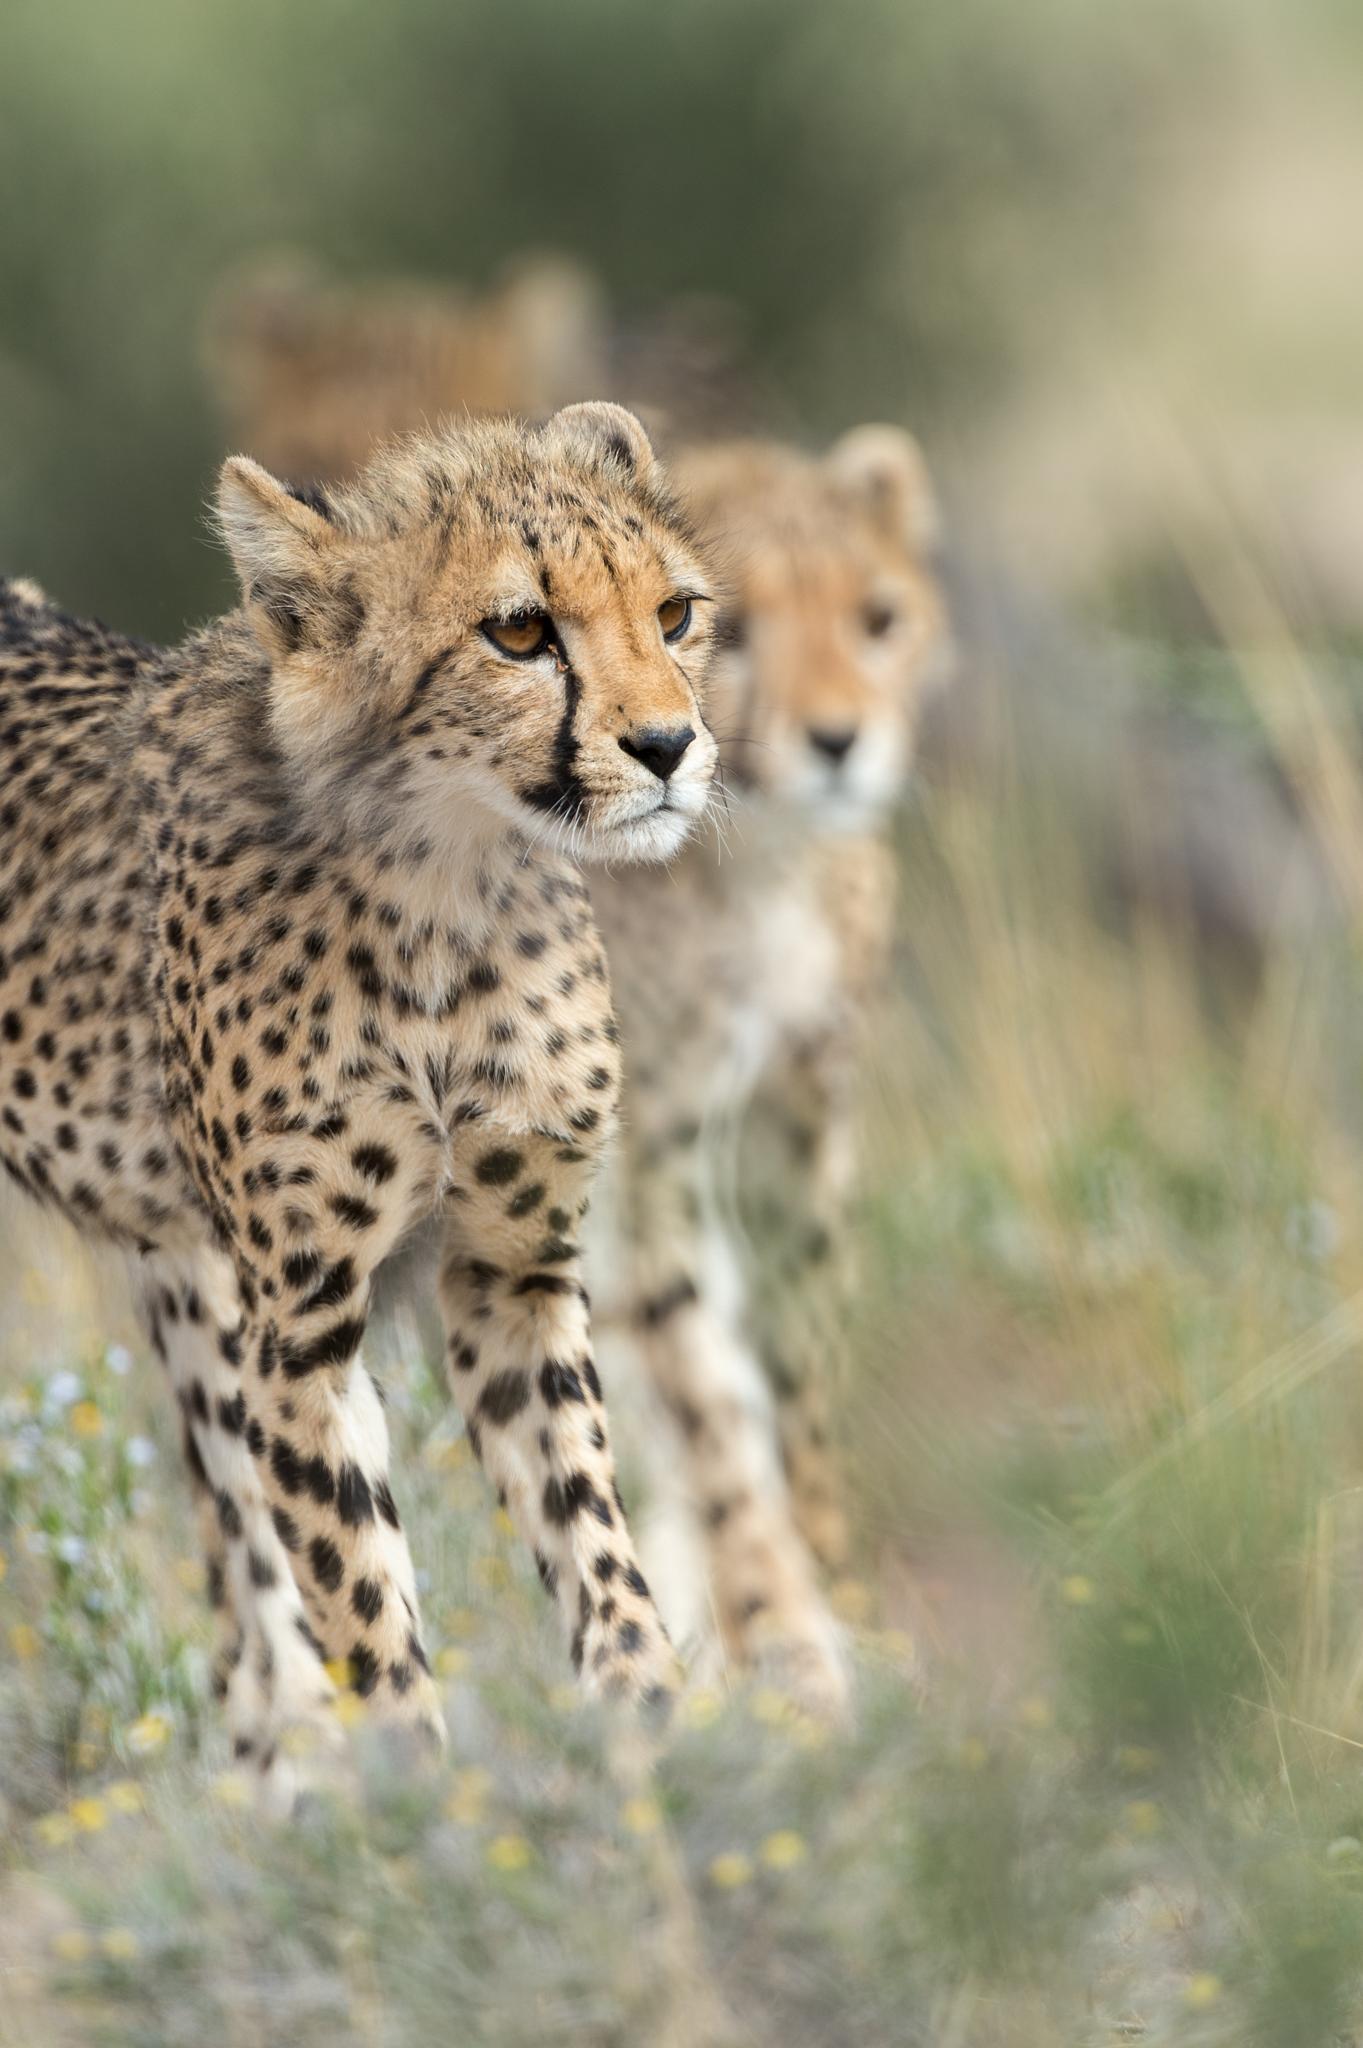 Cheetah visions by Bridgena Barnard